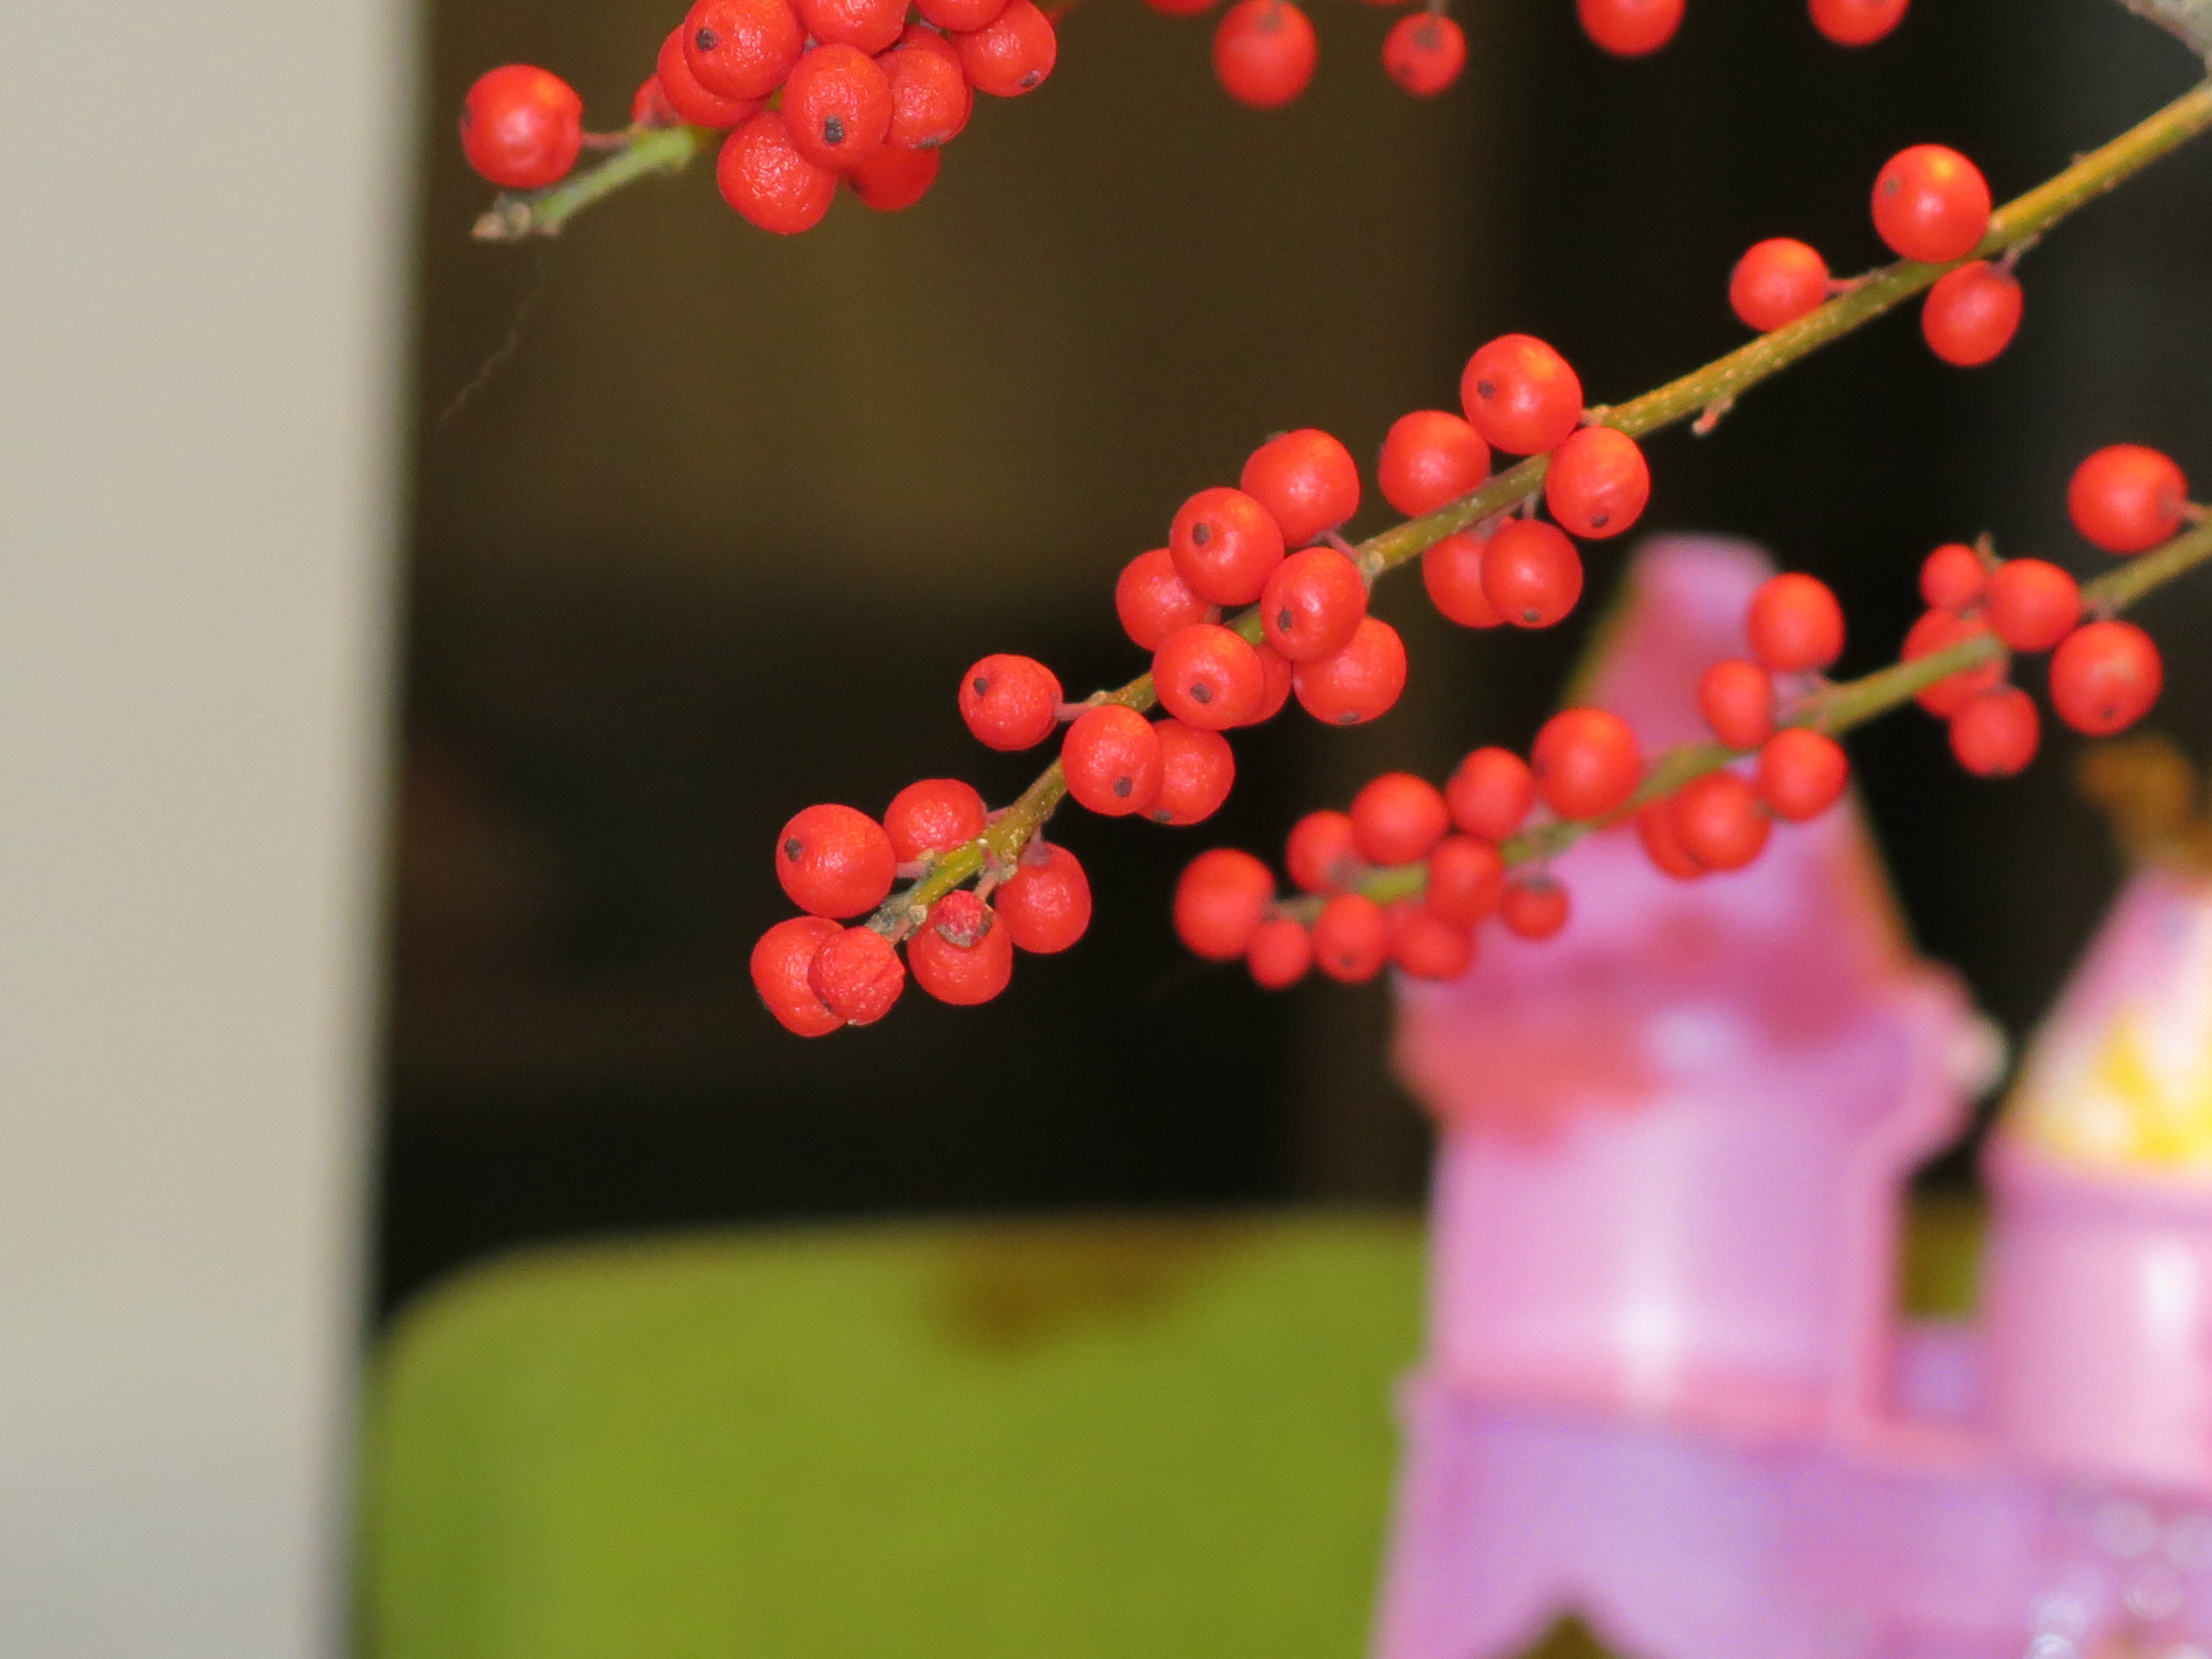 Erste Versuche in botanischer Fotografie